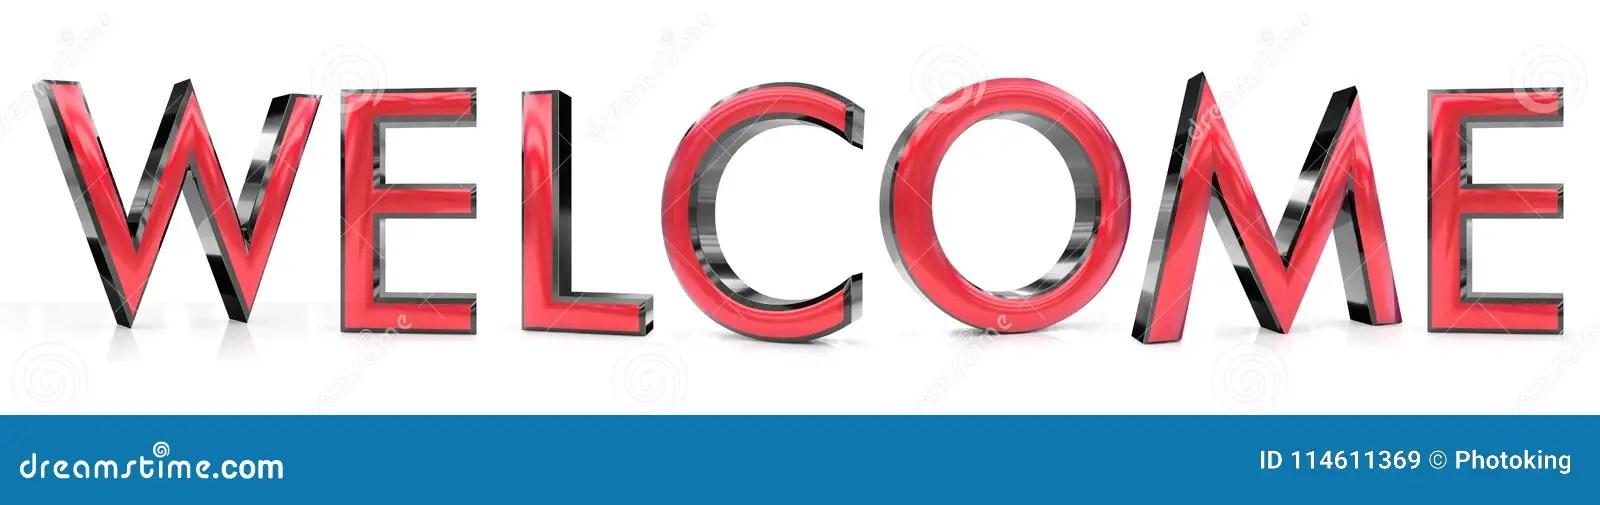 Welcome 3d word stock illustration Illustration of font - 114611369